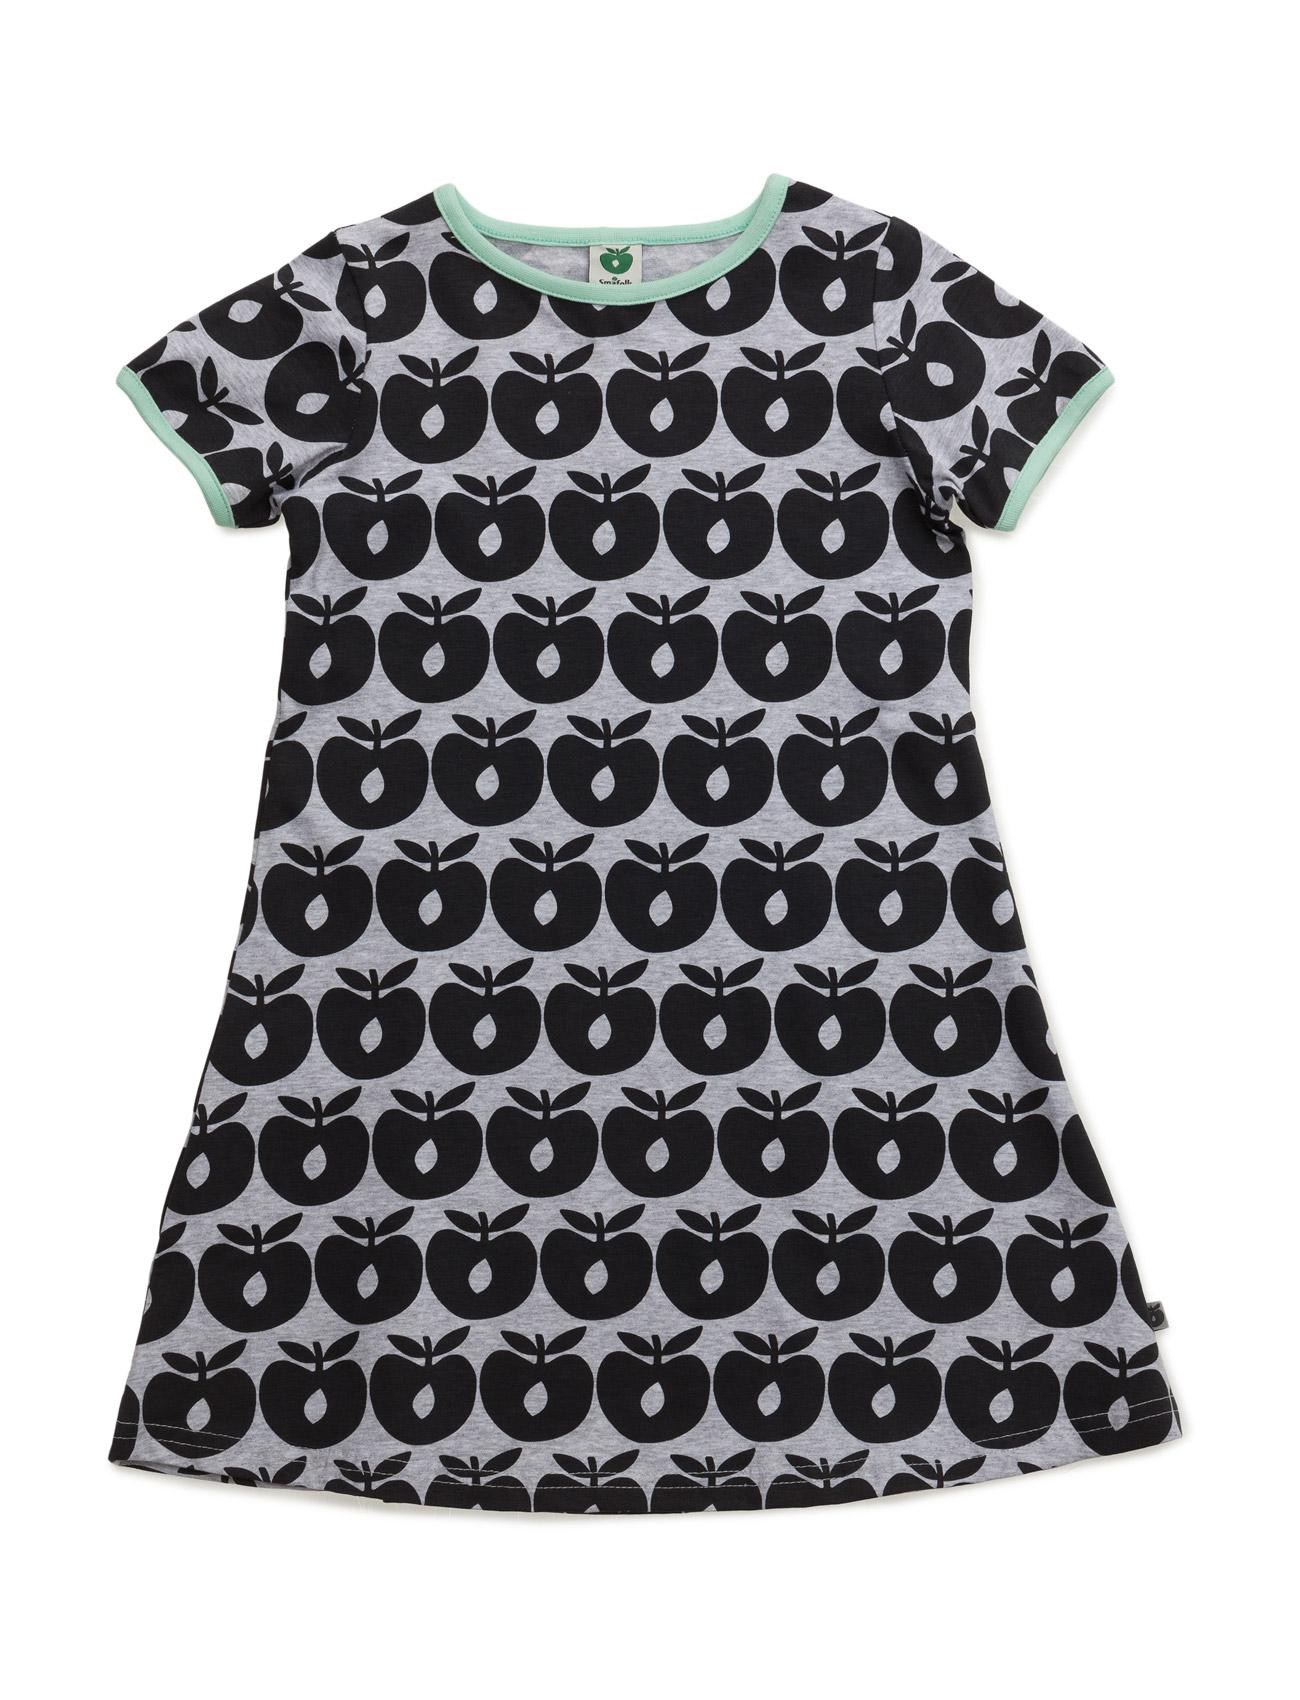 Dress Ss. Apples